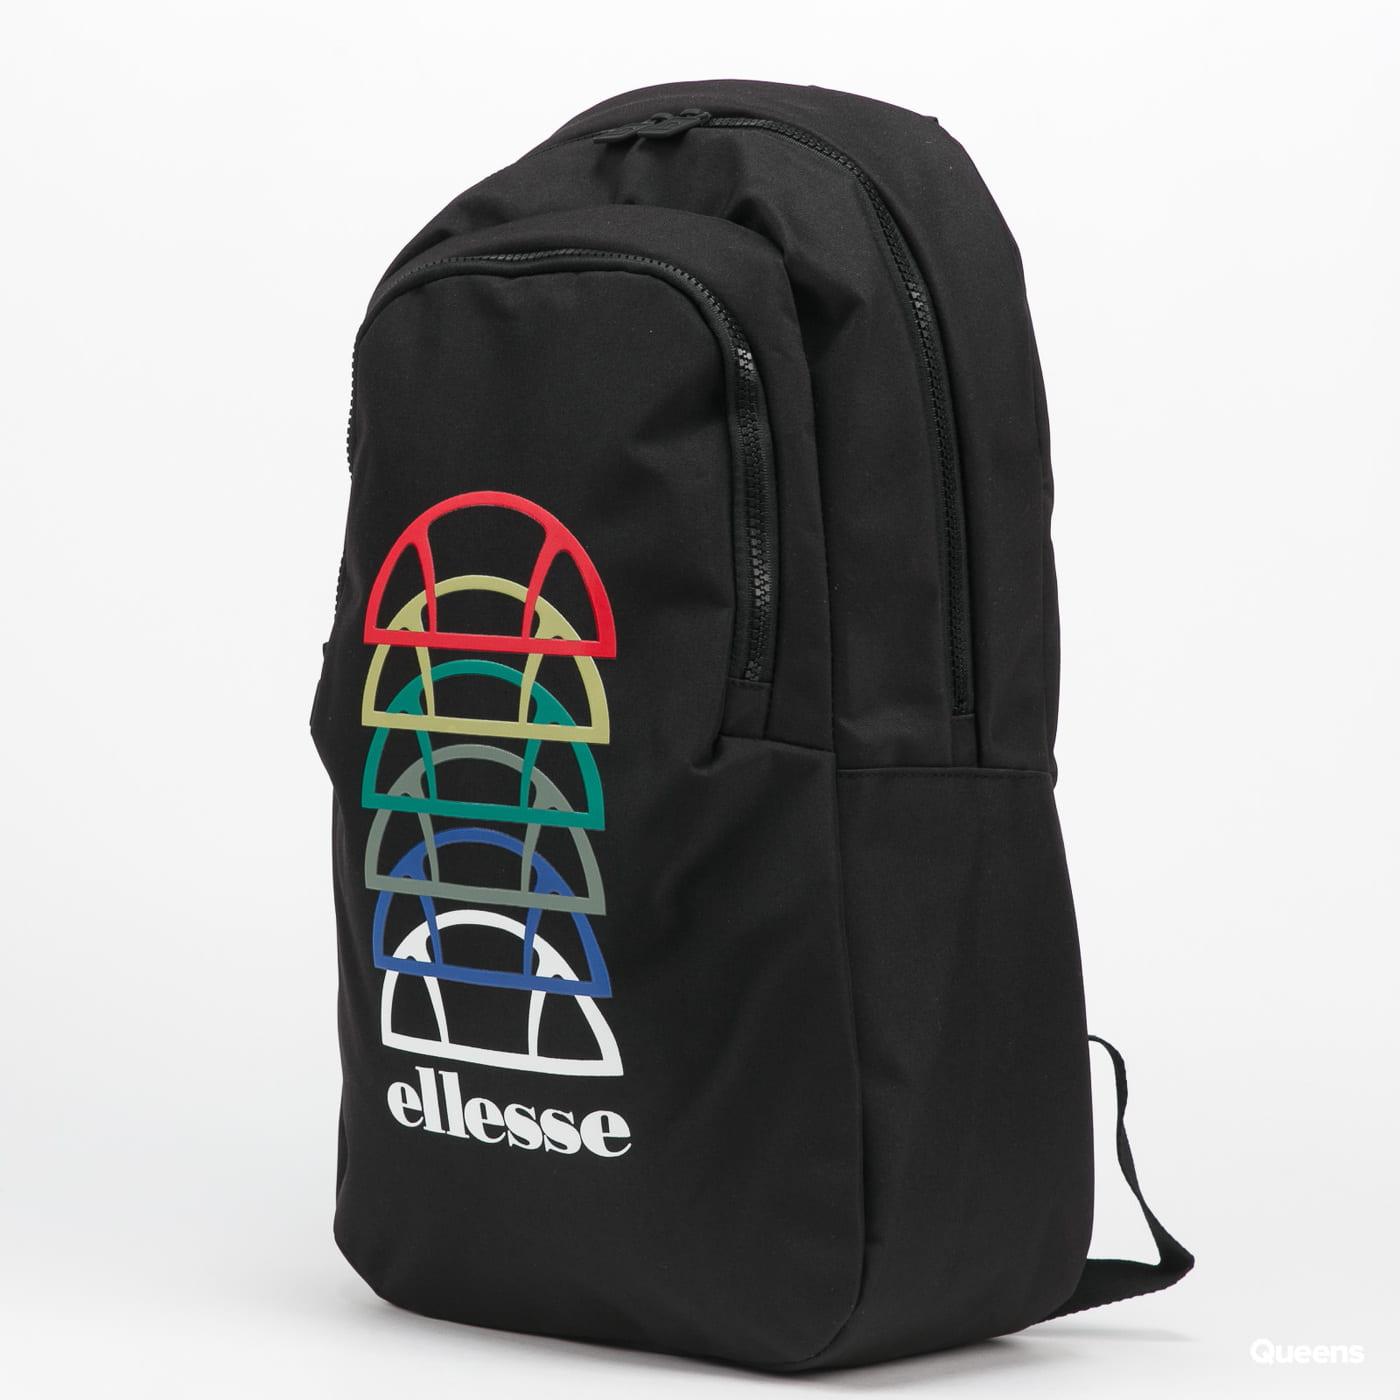 ellesse Tromia Backpack černý